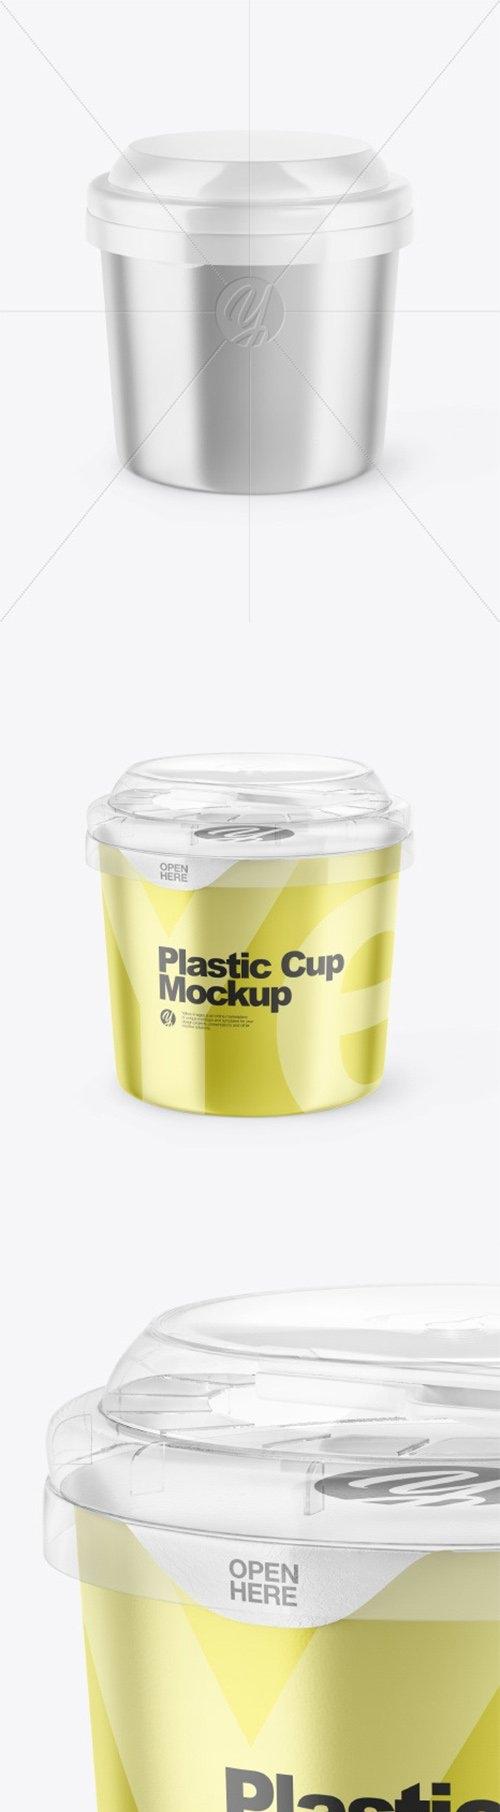 Metallic Cup Mockup 66435